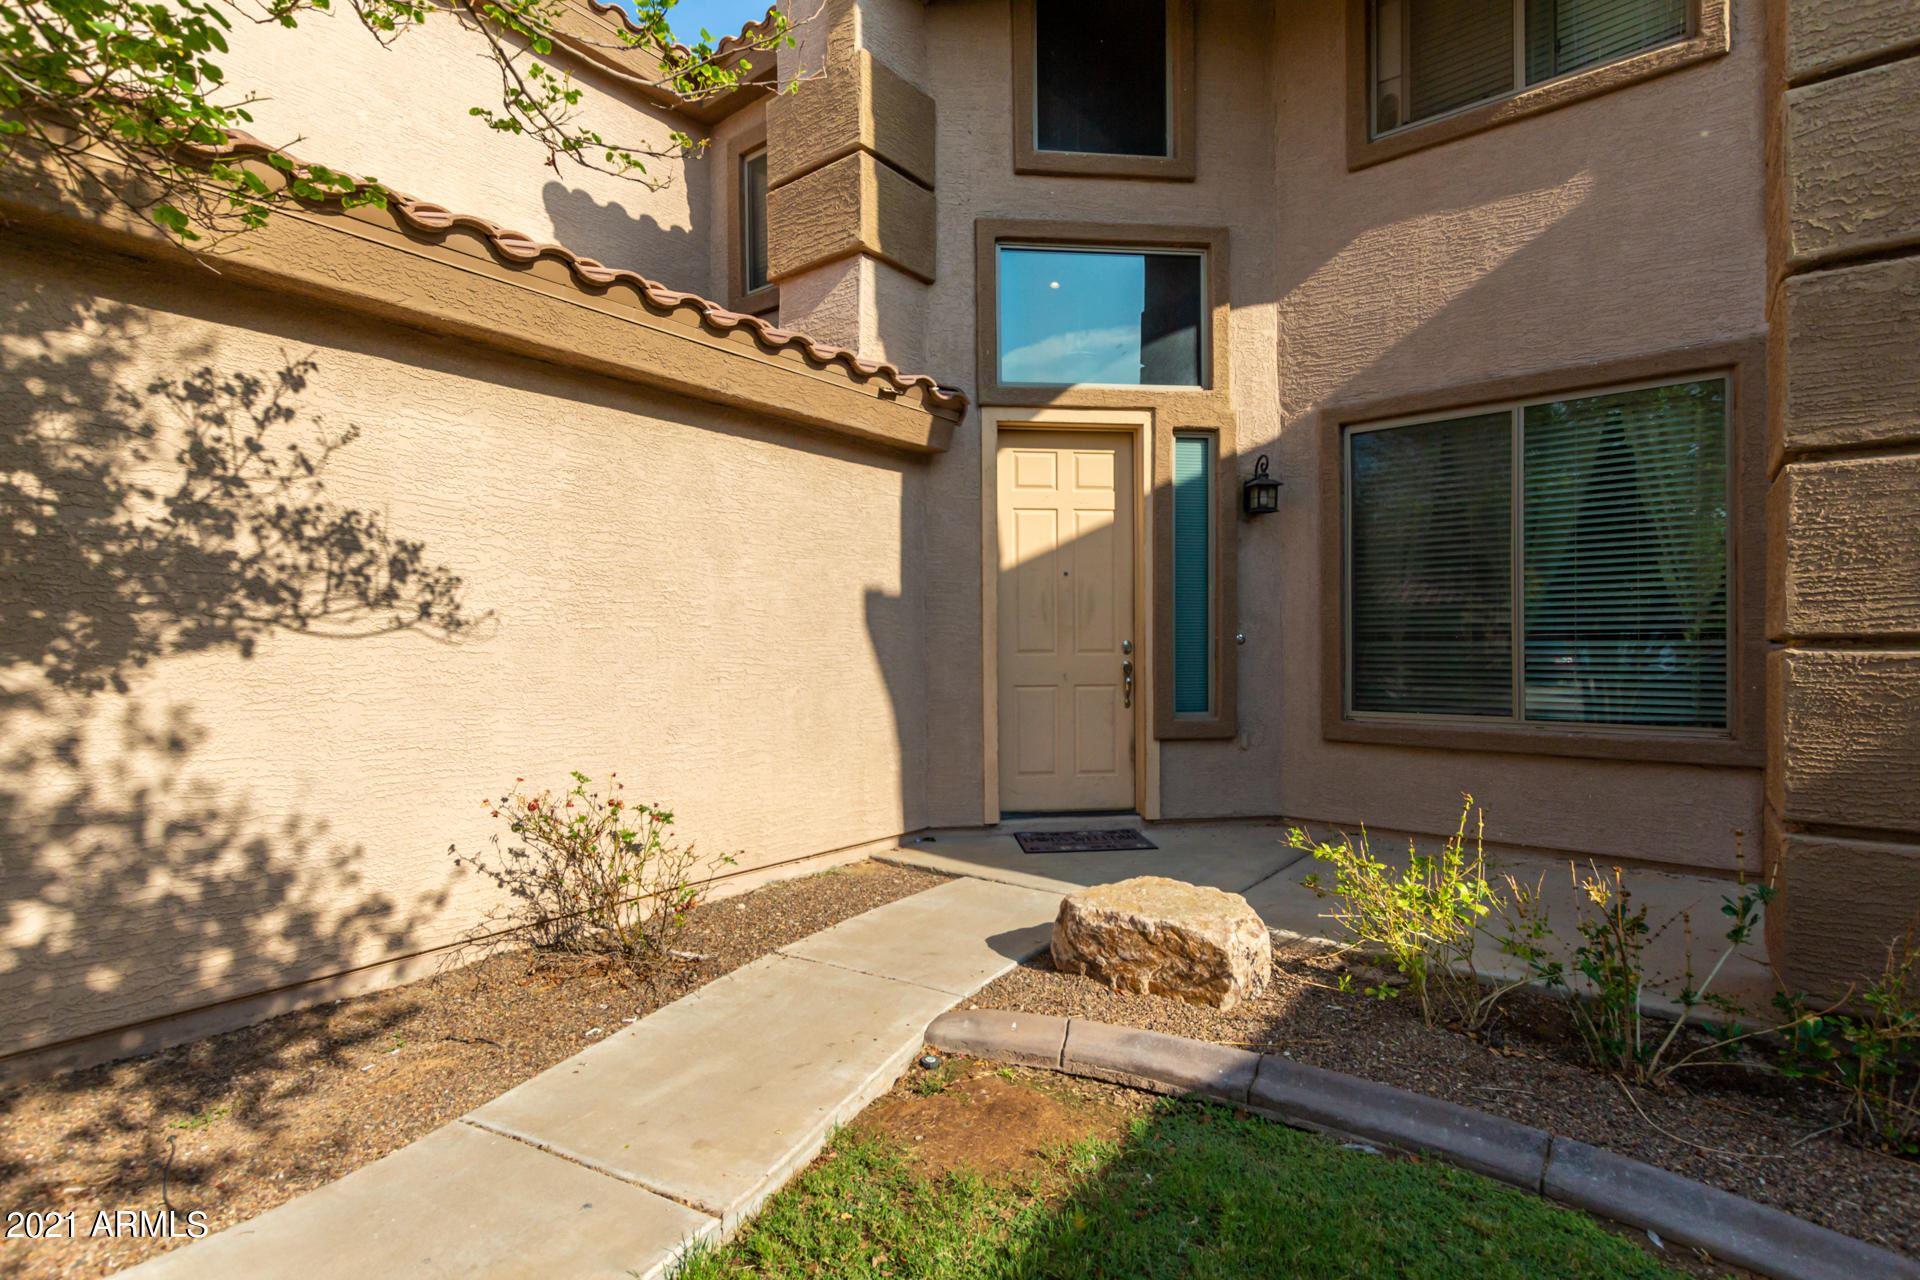 Photo of 44355 W YUCCA Lane, Maricopa, AZ 85138 (MLS # 6268547)